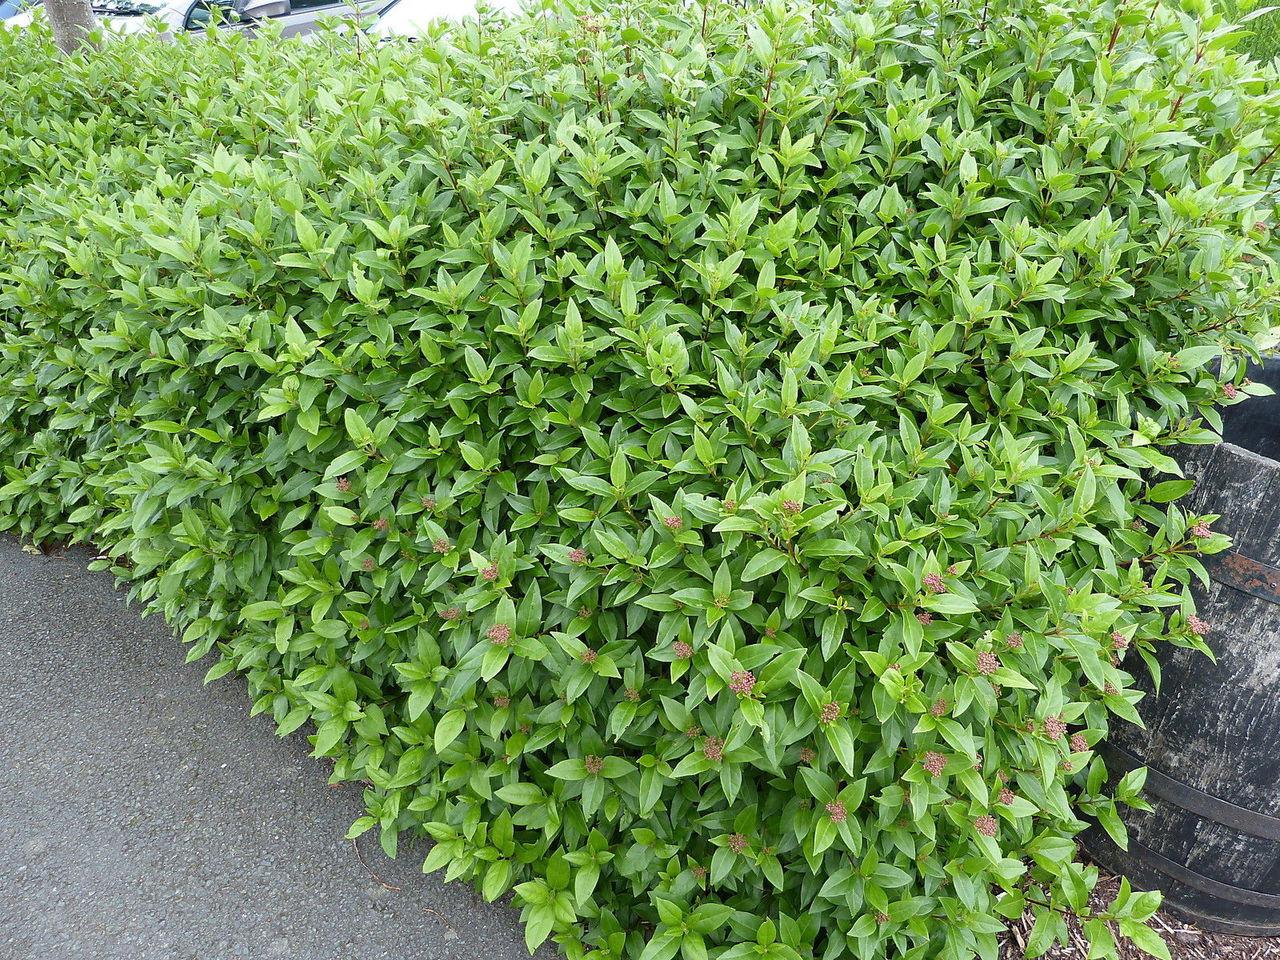 3 laurustinus viburnum tinus 15 25cm in 9cm pots fast growing evergreen hedging plants - Fast growing hedging plants ...